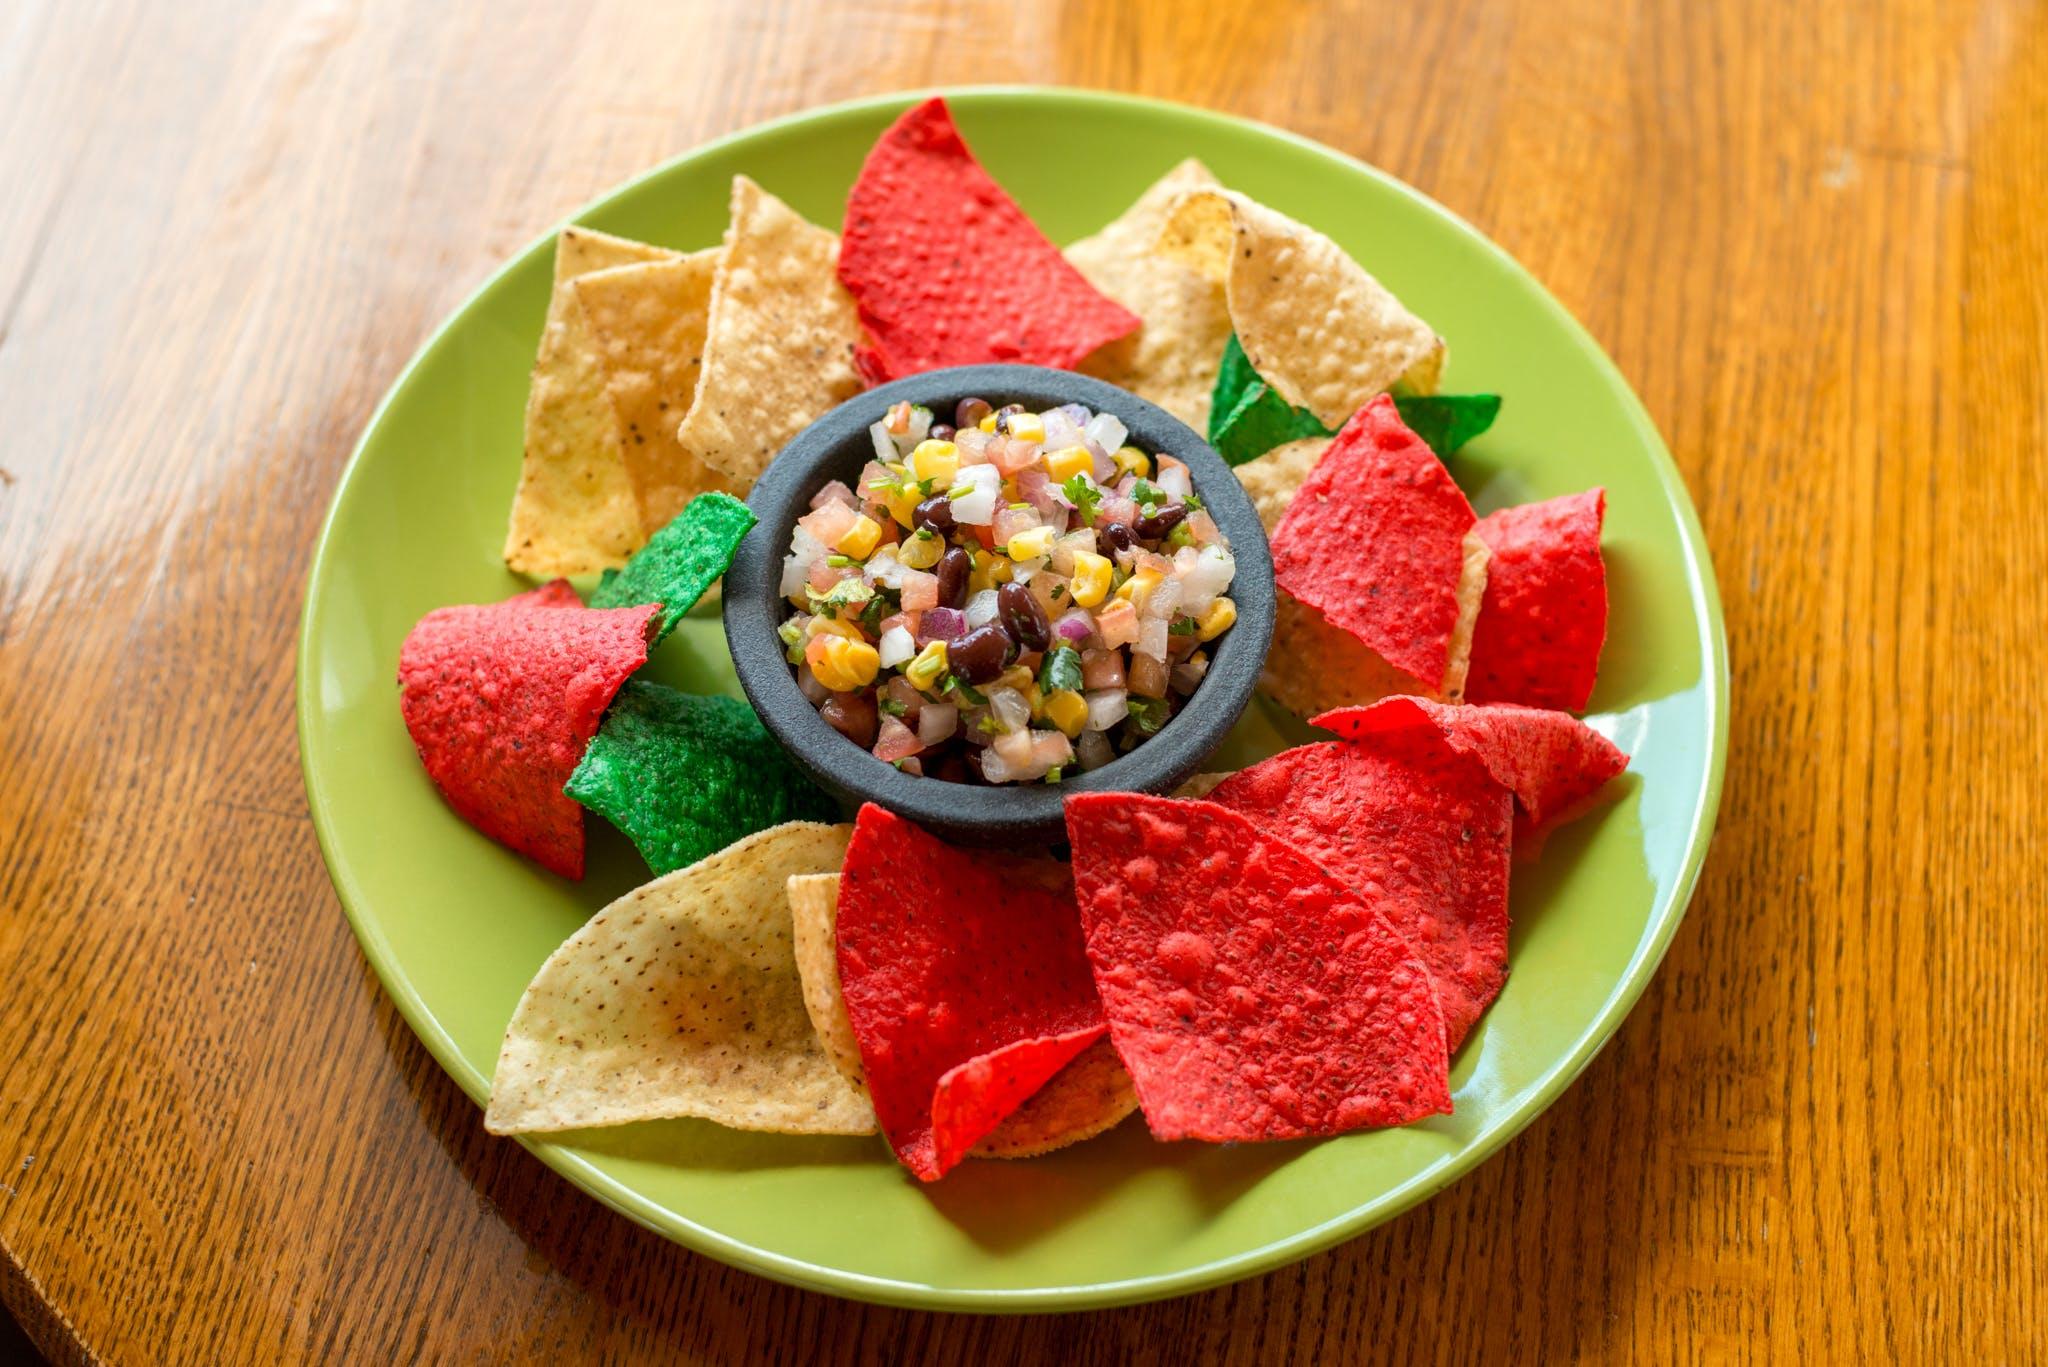 Black Bean Salad & Chips from Taqueria Maldonado's - Main Street in Green Bay, WI